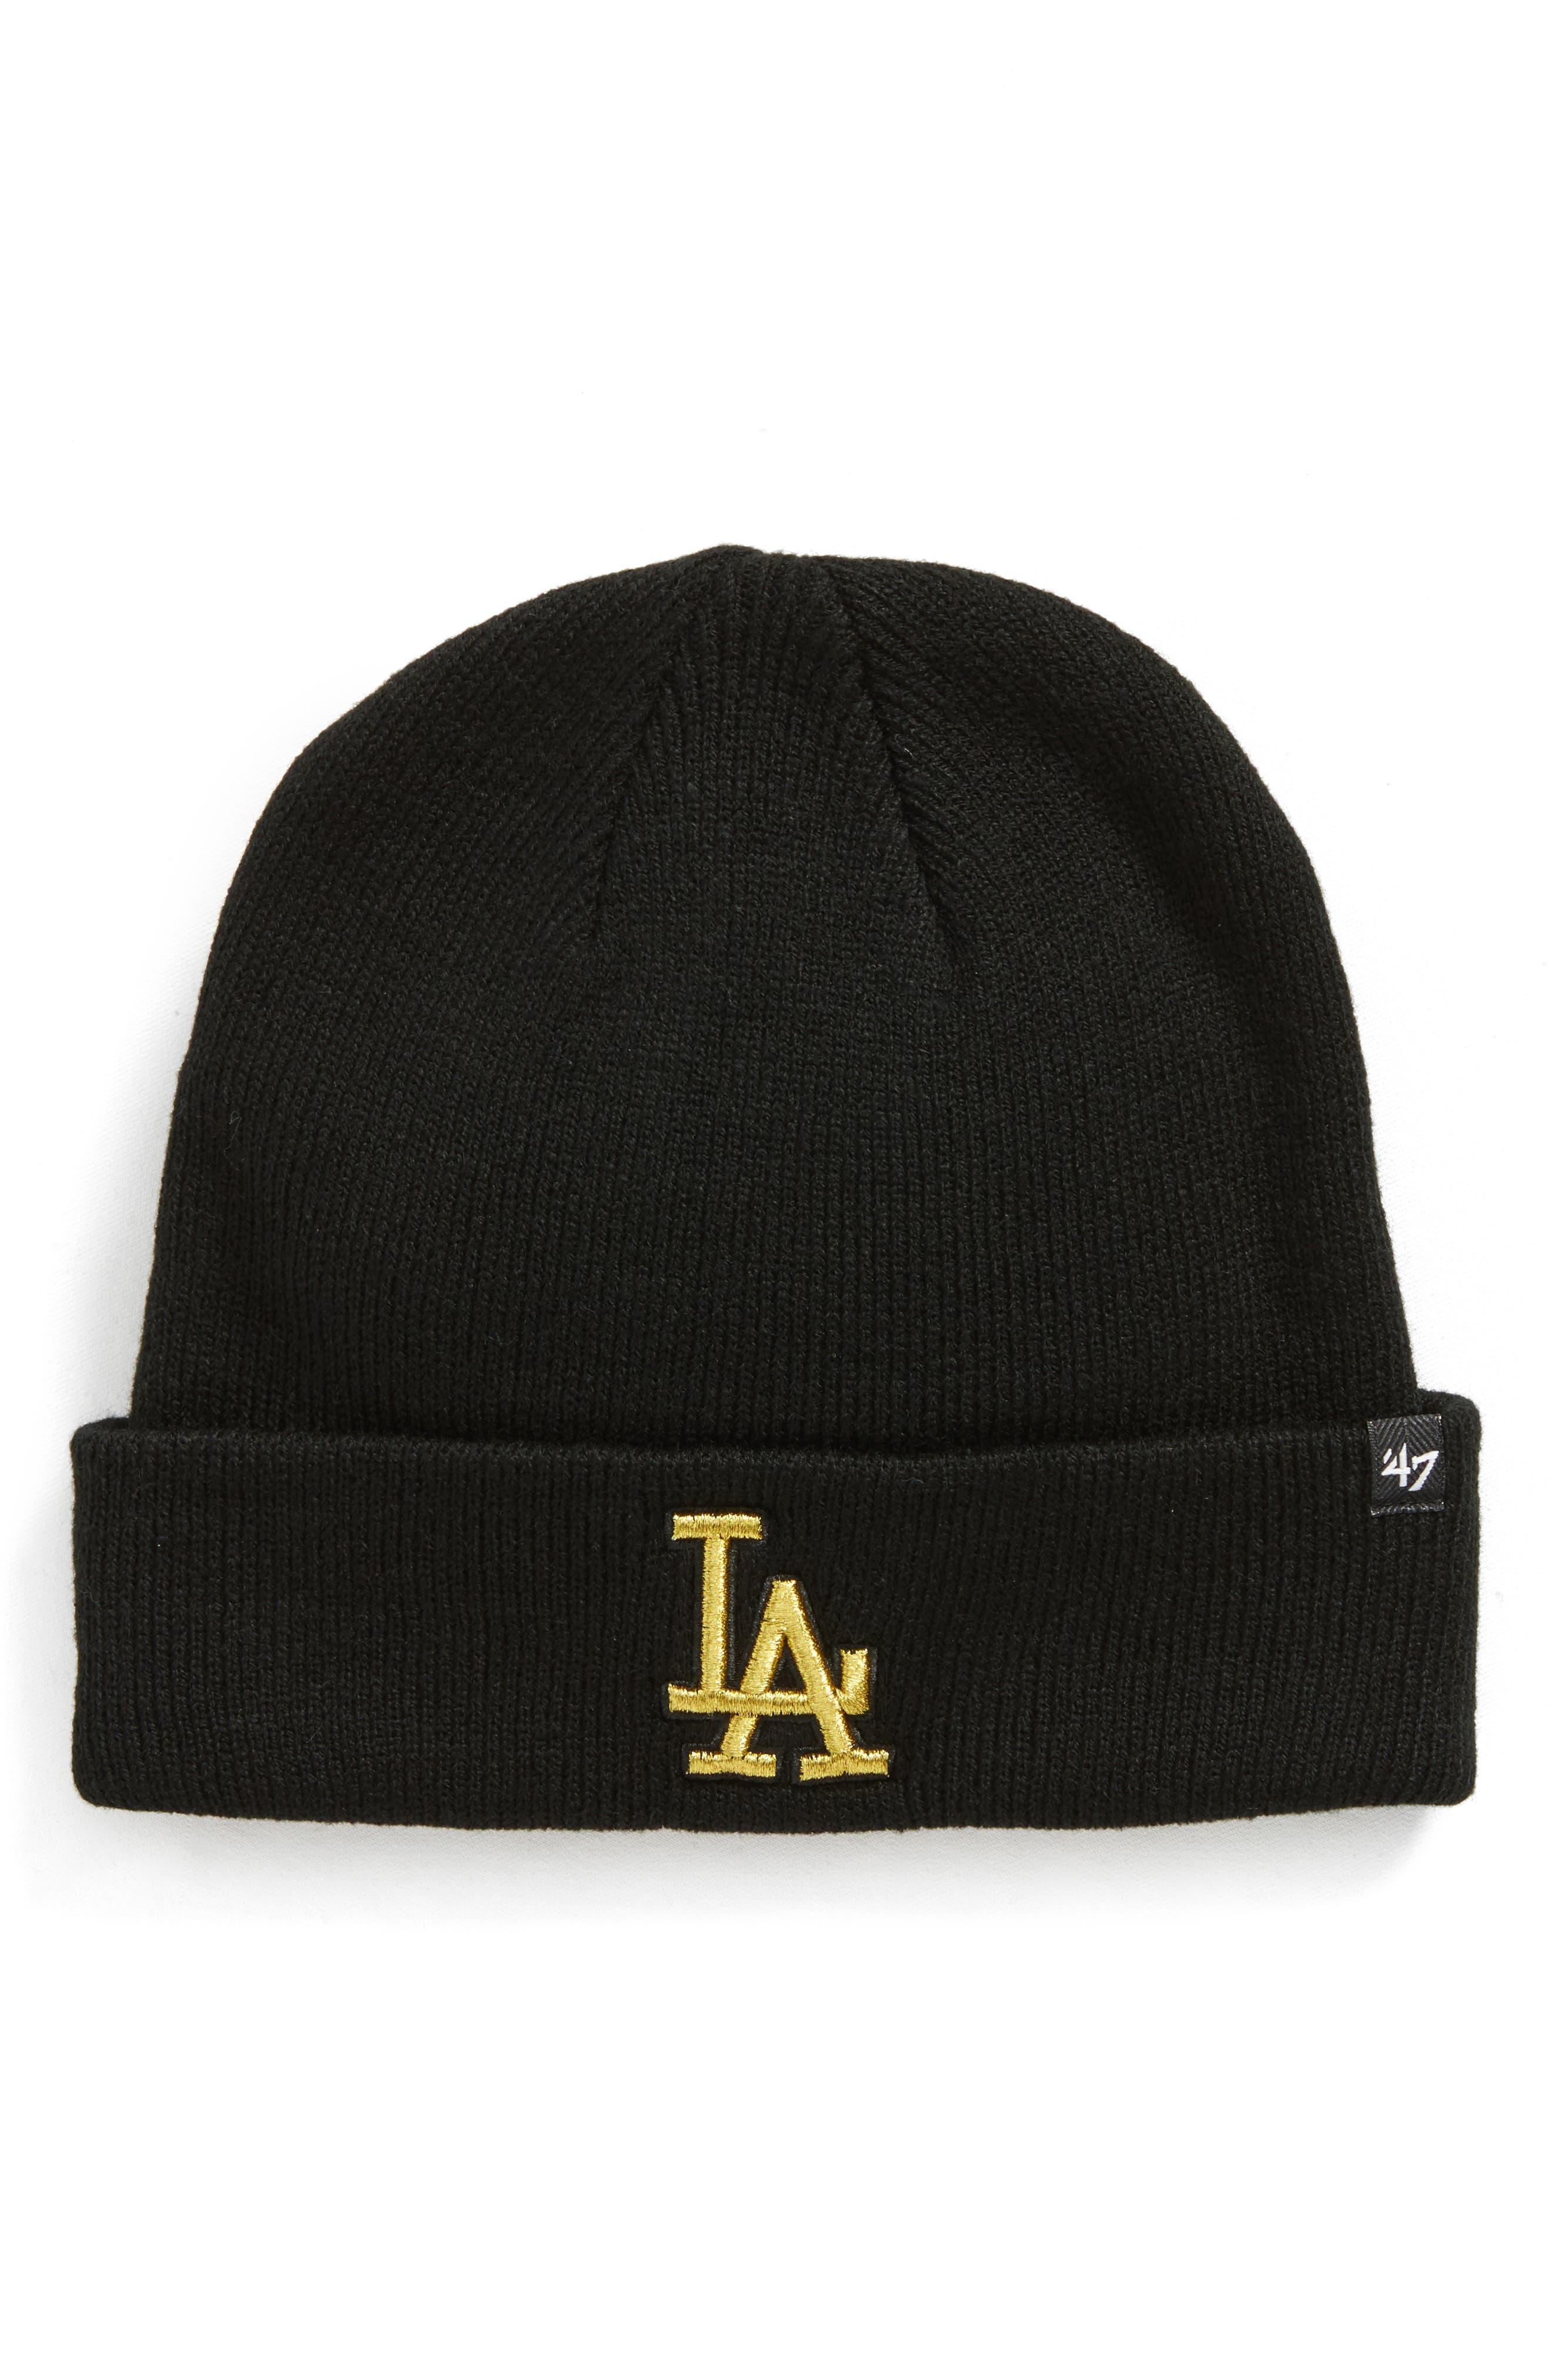 Los Angeles Dodgers Metallic Beanie,                         Main,                         color, Black